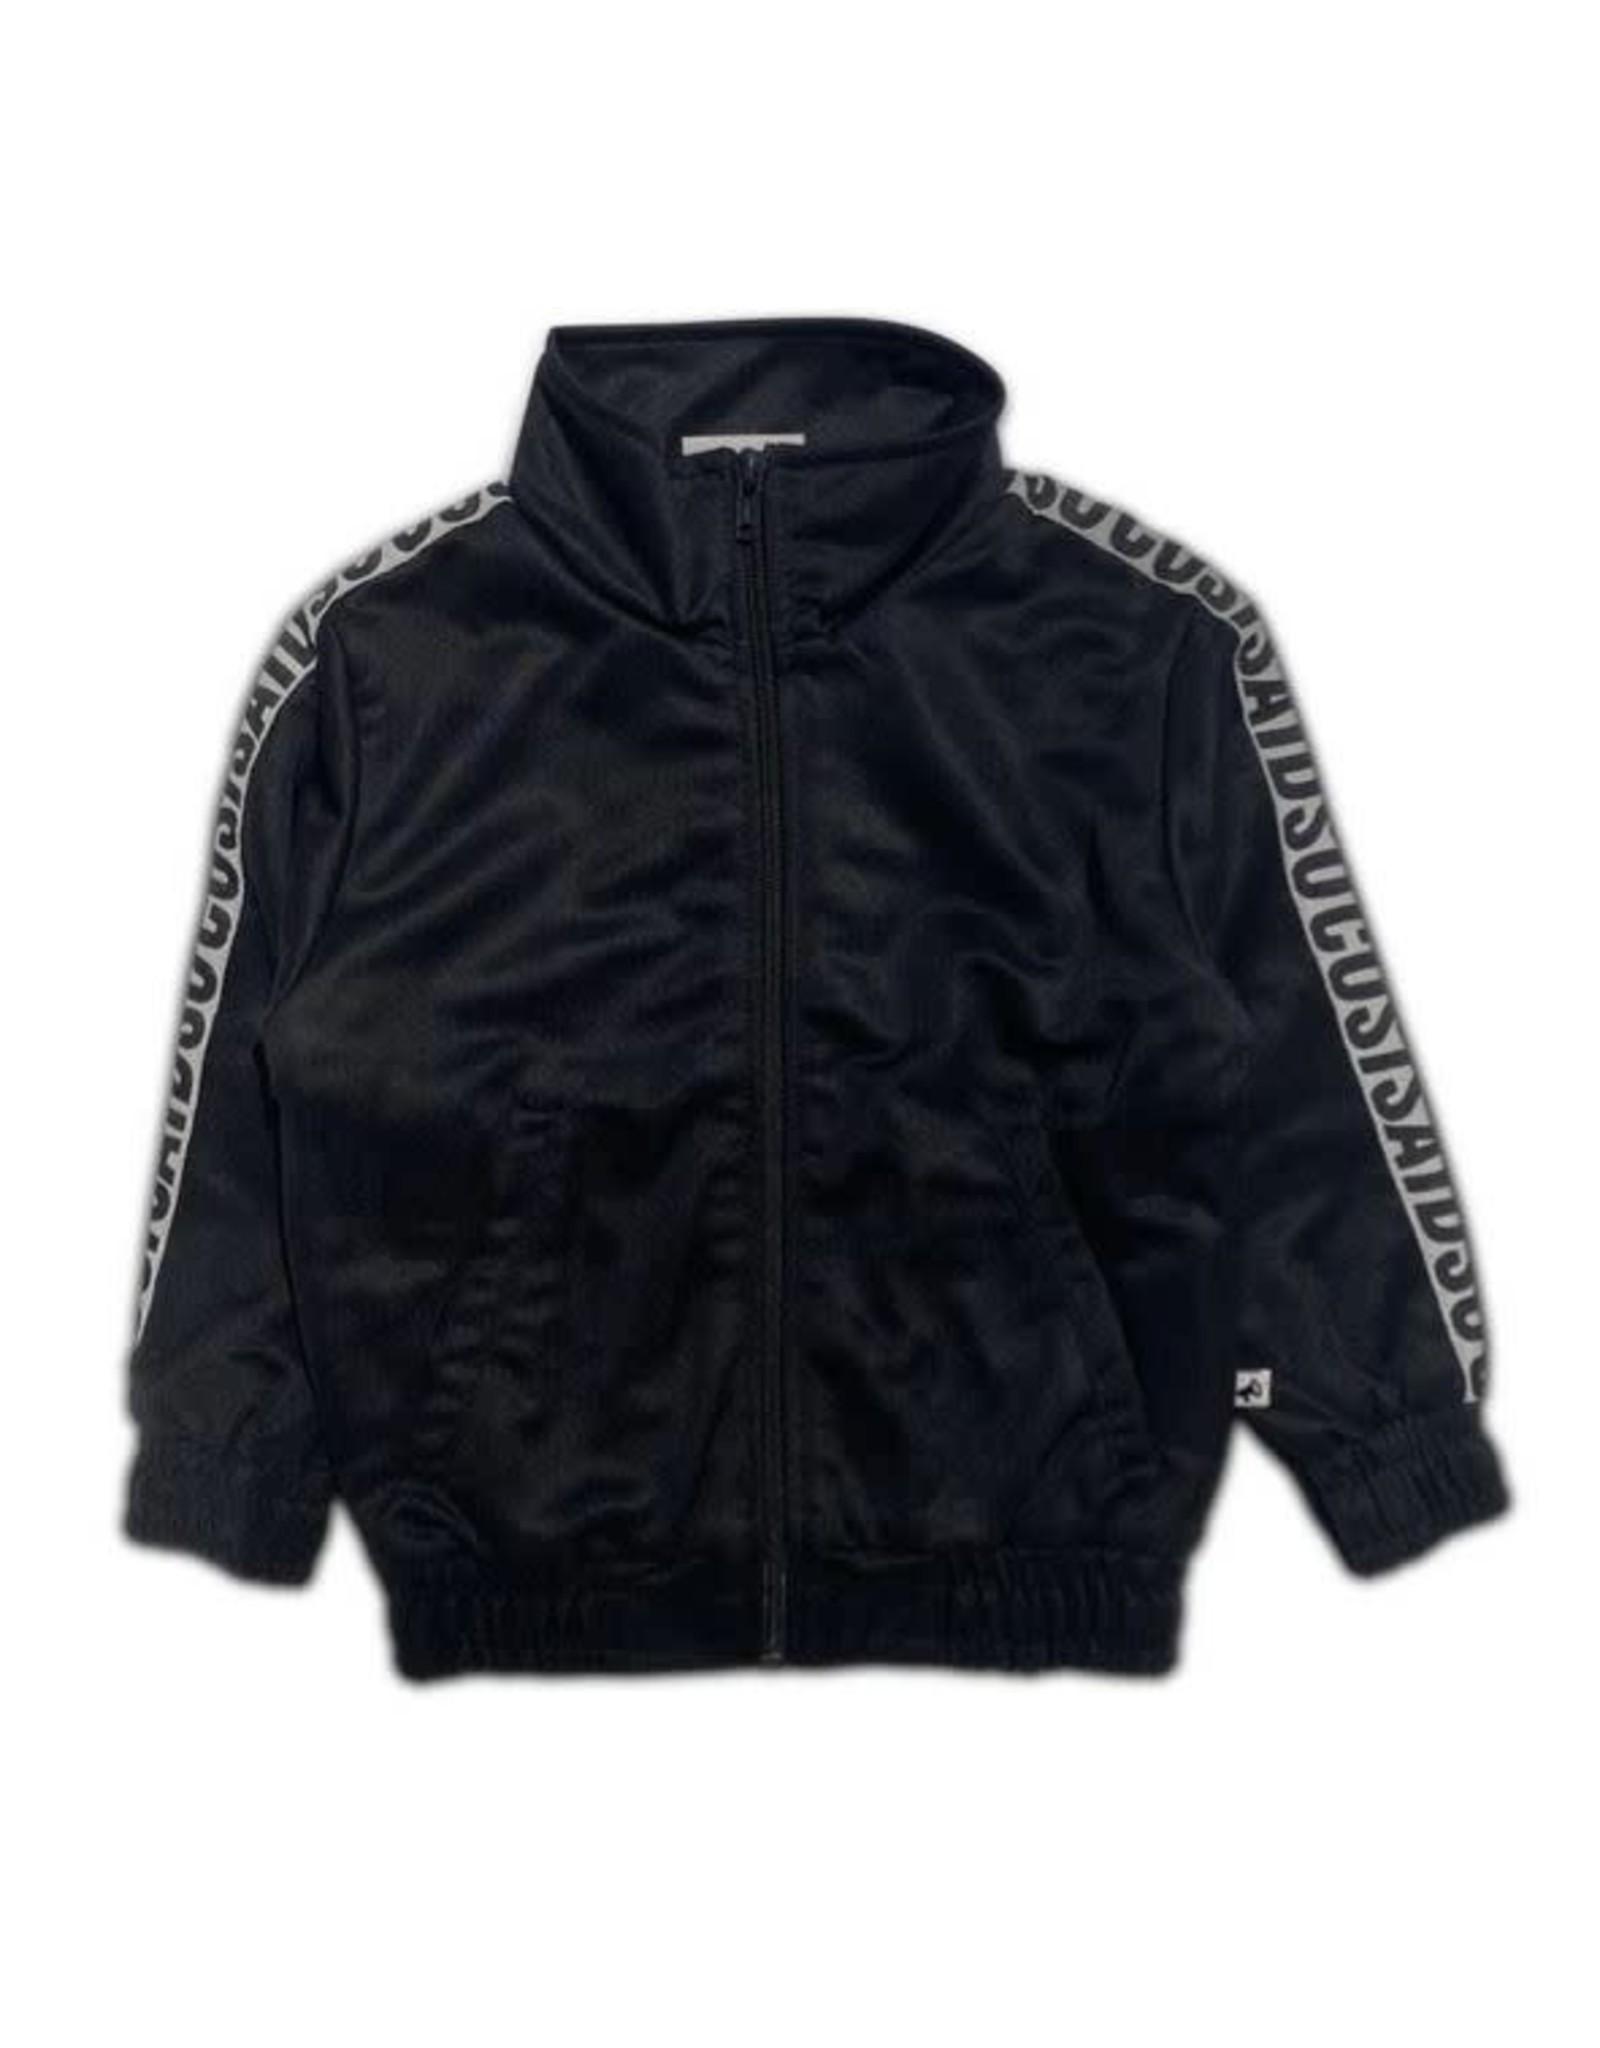 Cos I Said So track suit jacket black